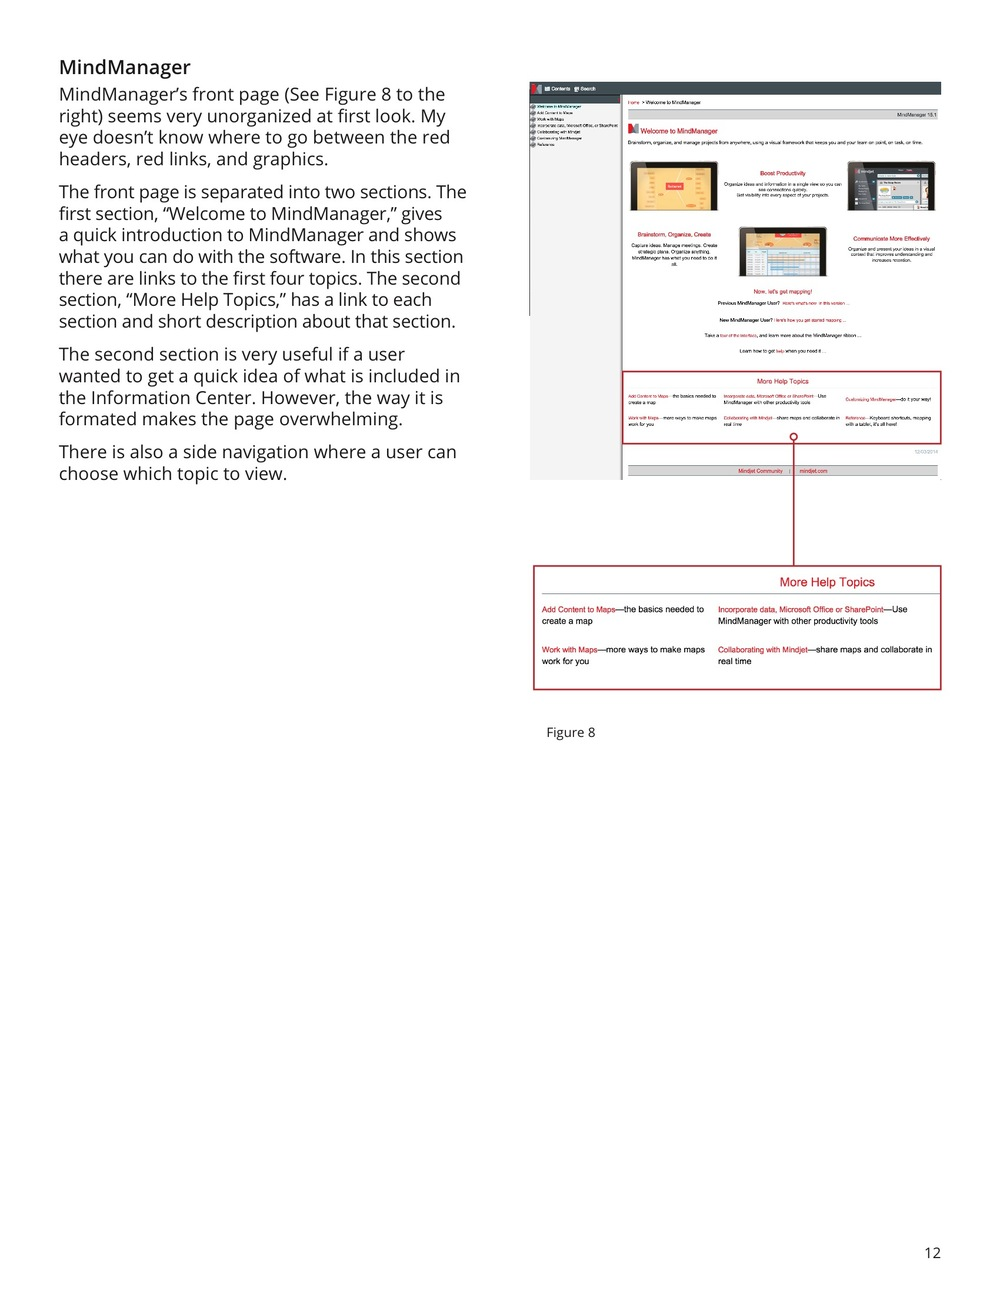 XMind Final Report_4-23-15 12-12.jpeg